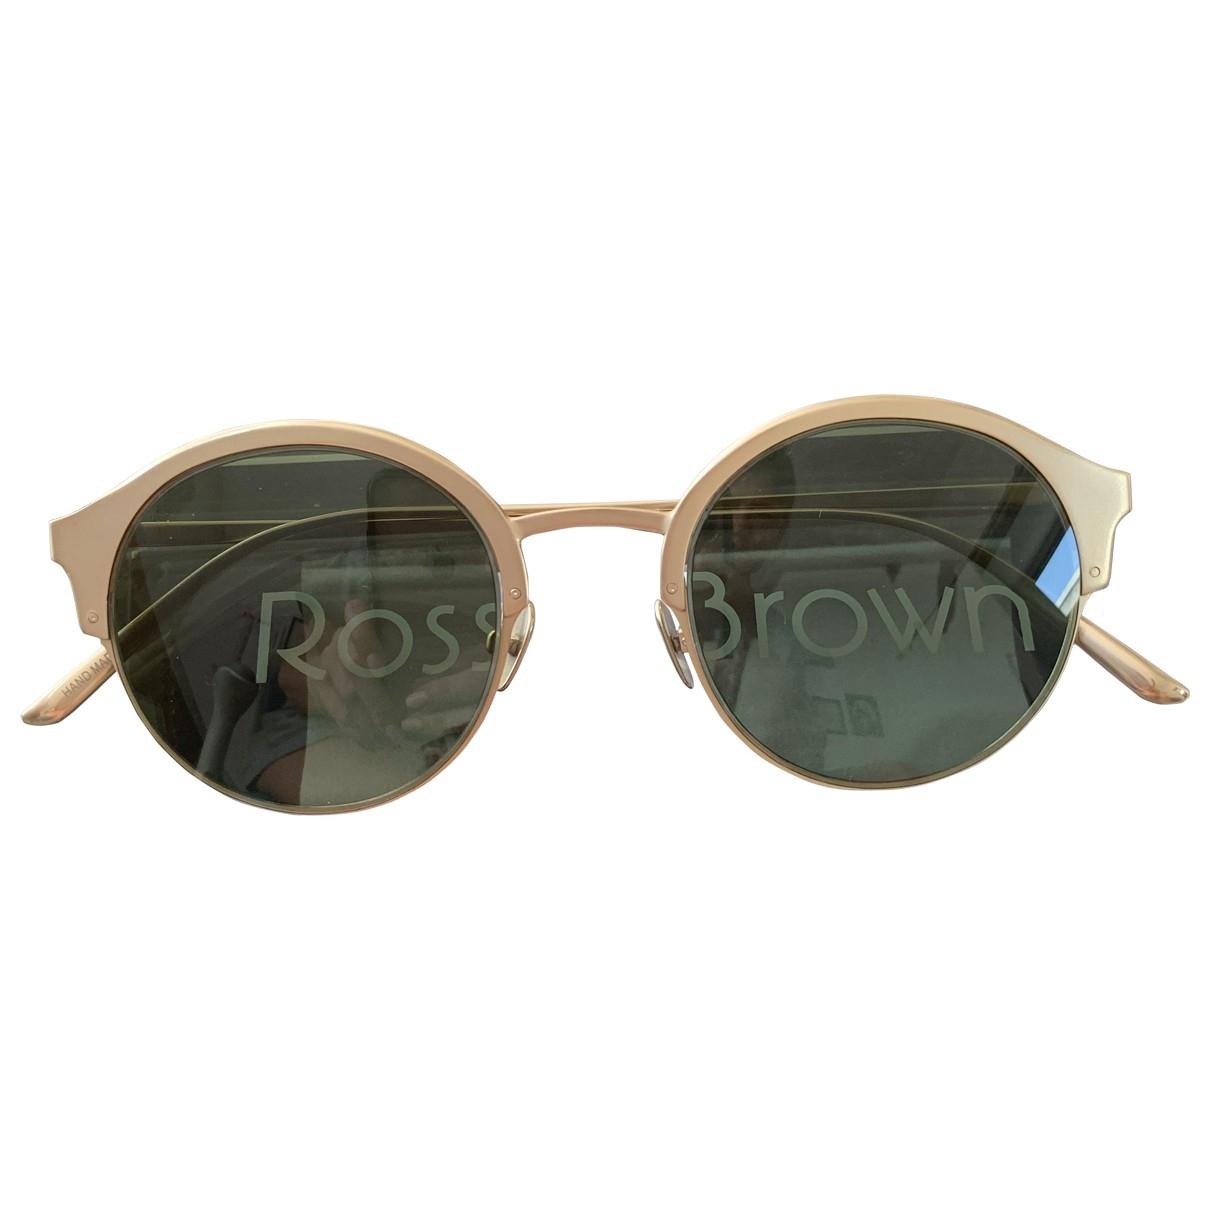 Ross & Brown \N Gold Metal Sunglasses for Women \N